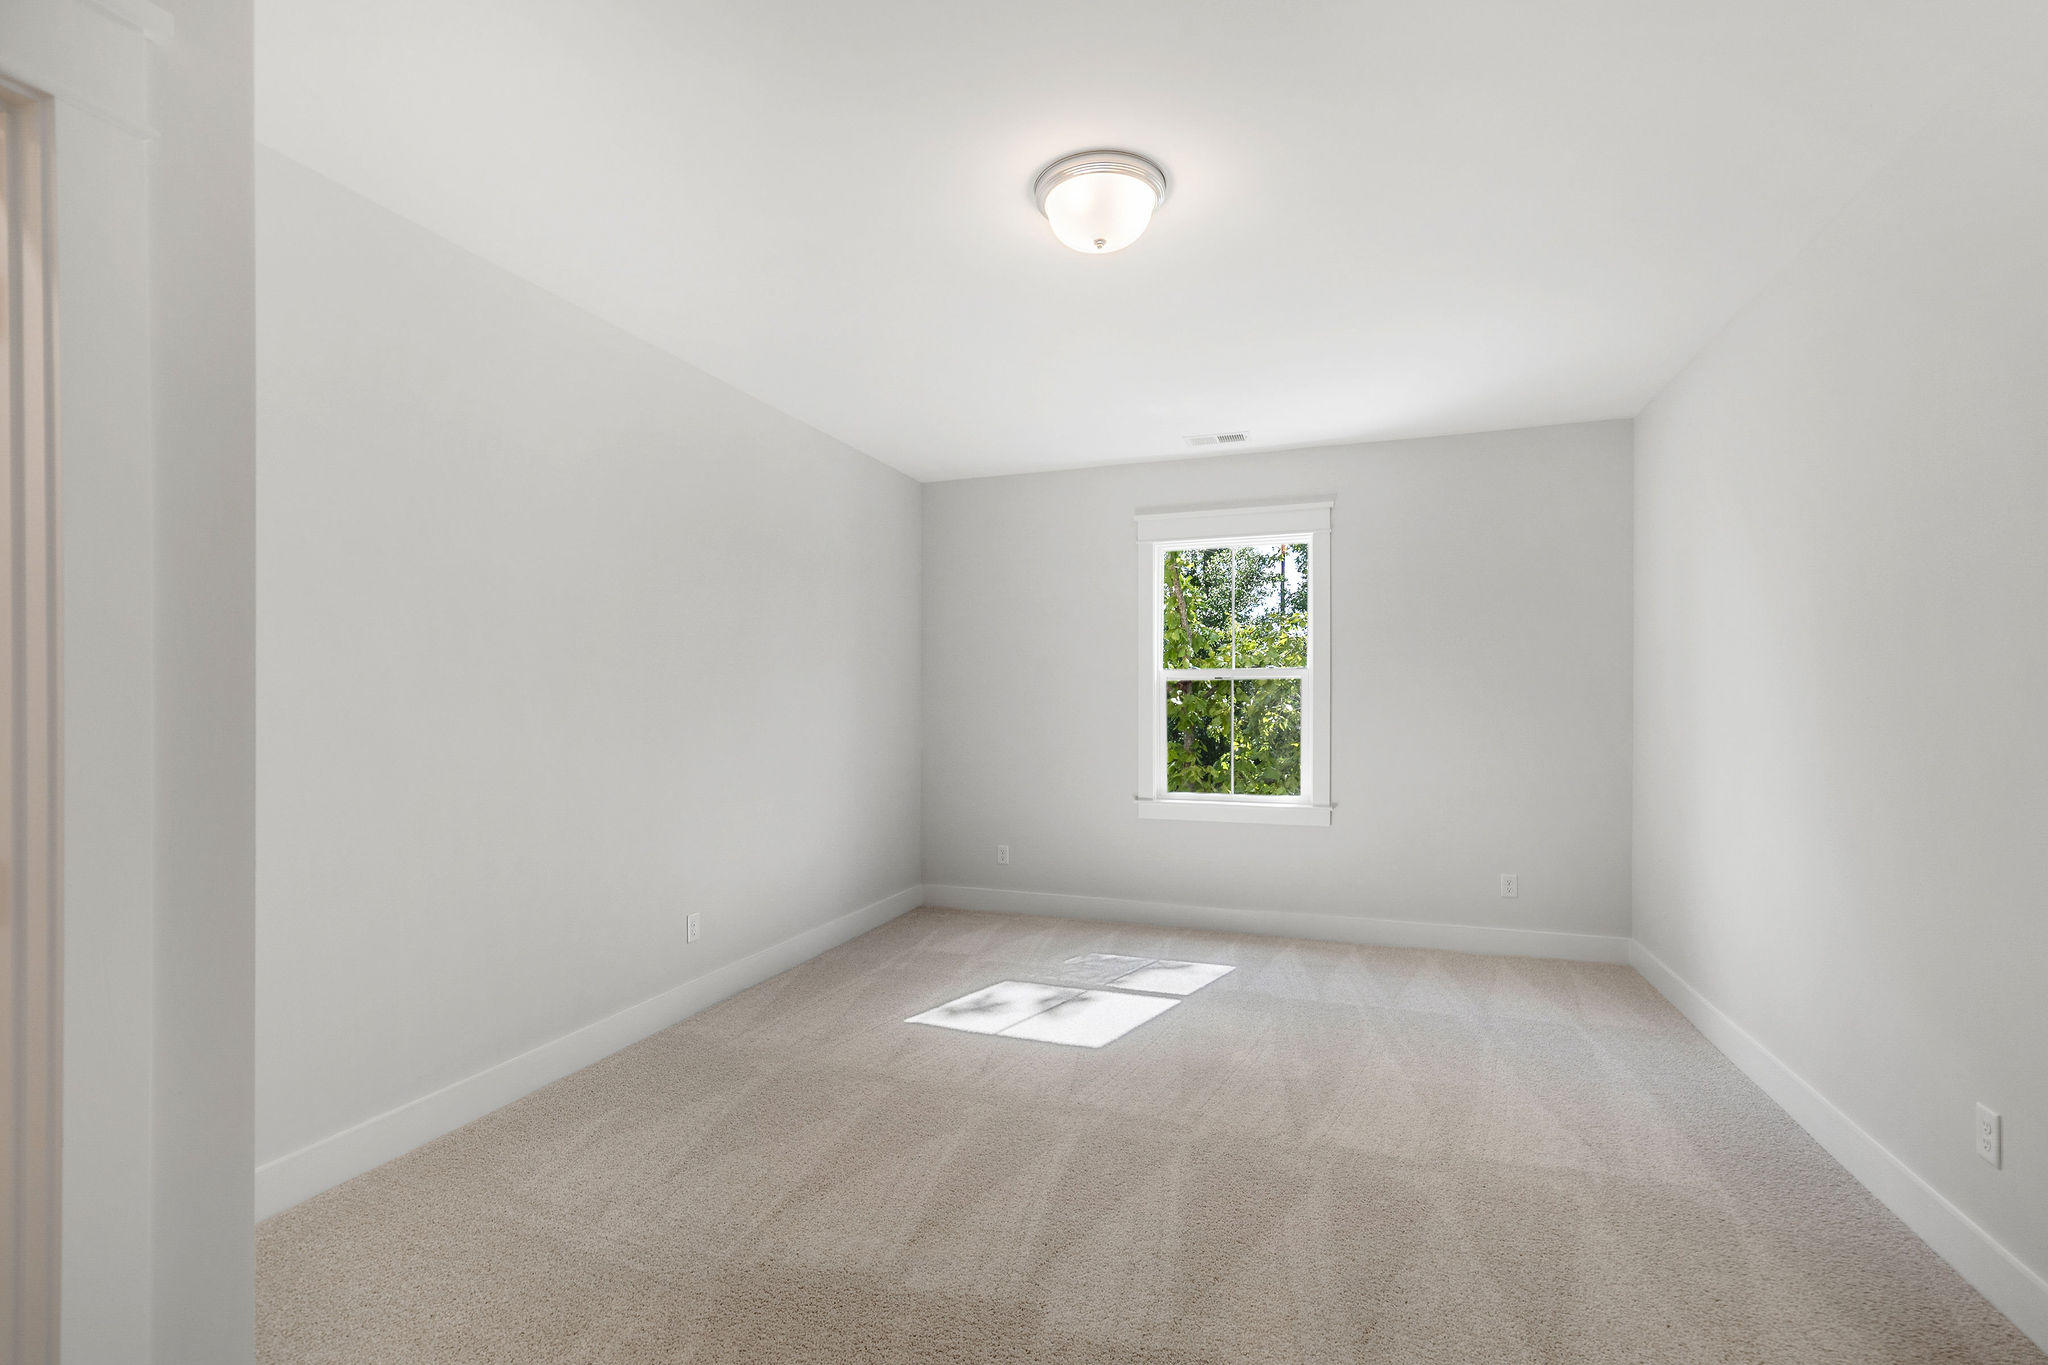 Park West Homes For Sale - 2291 Middlesex, Mount Pleasant, SC - 21